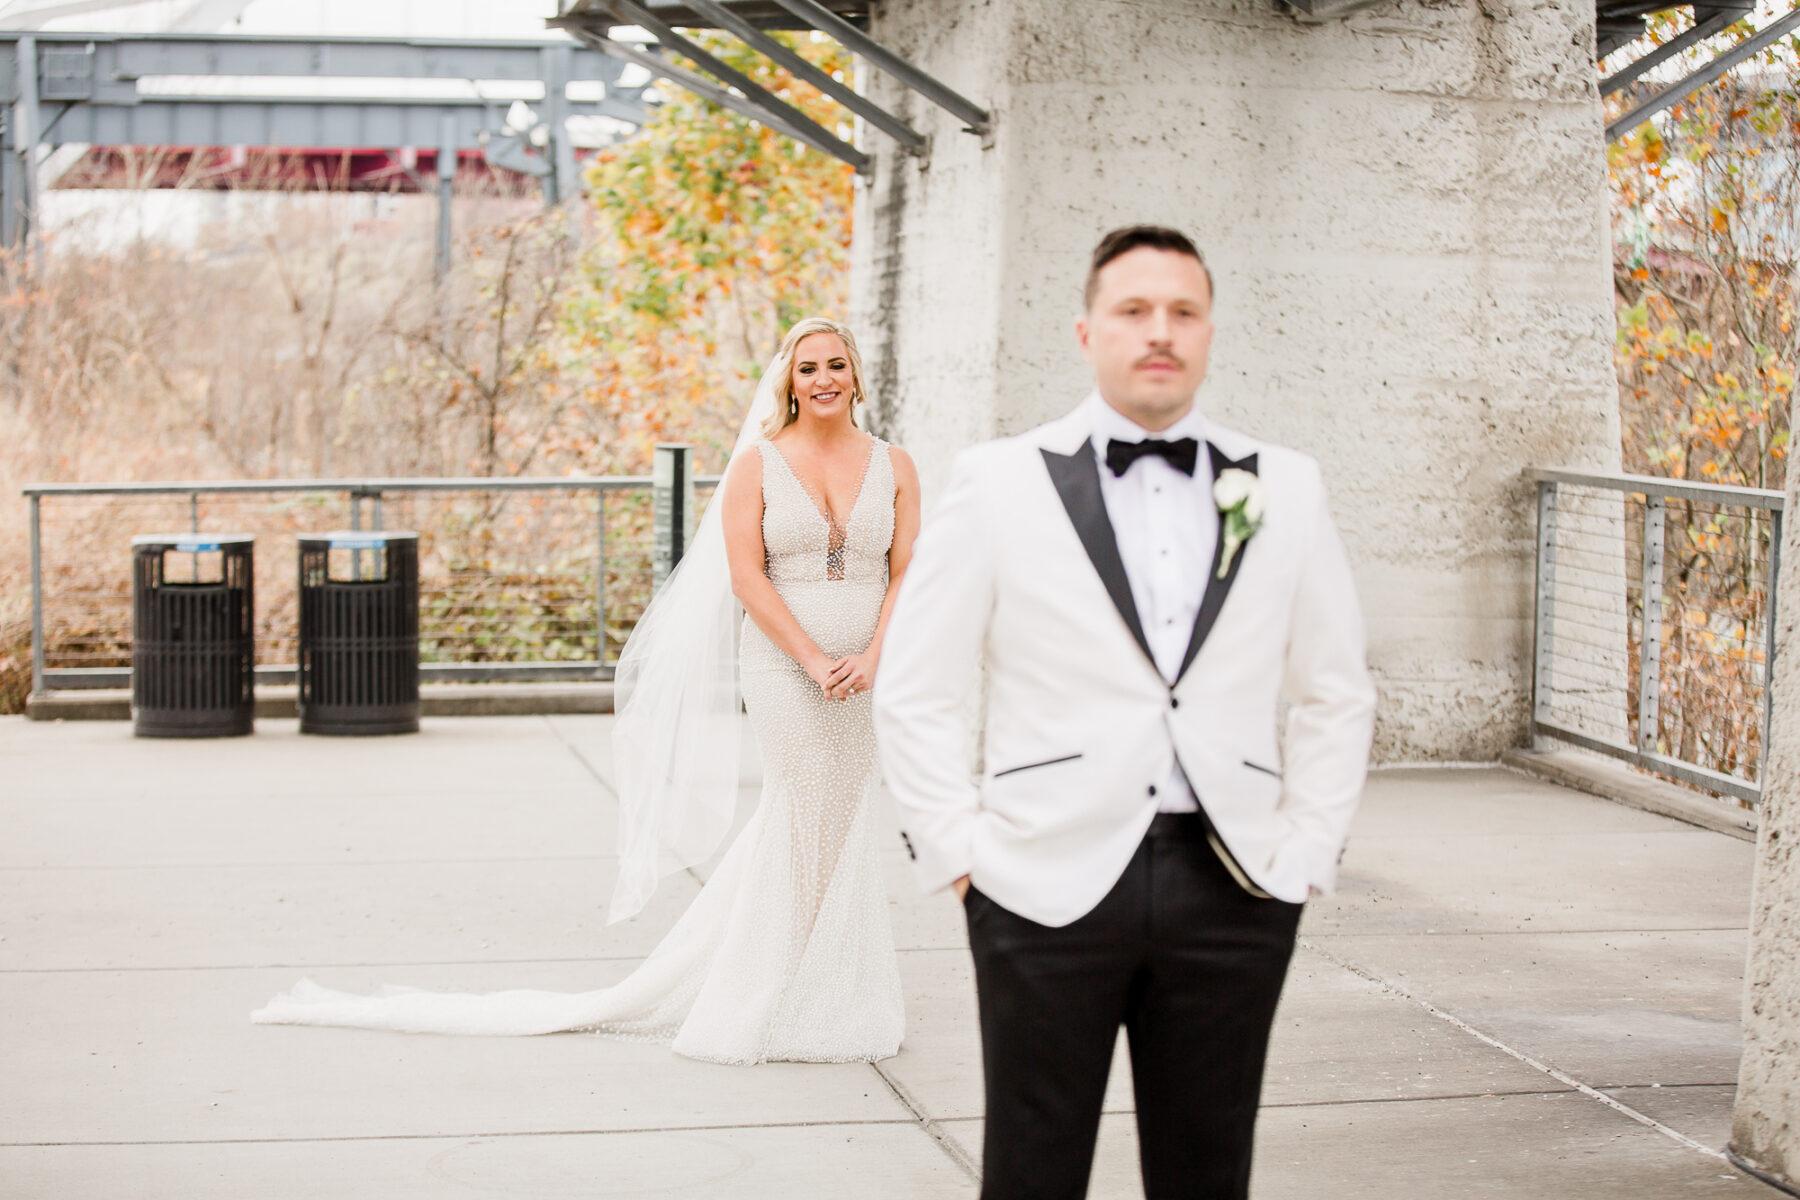 Amanda May Photos Nashville Wedding Photography | Nashville Bride Guide